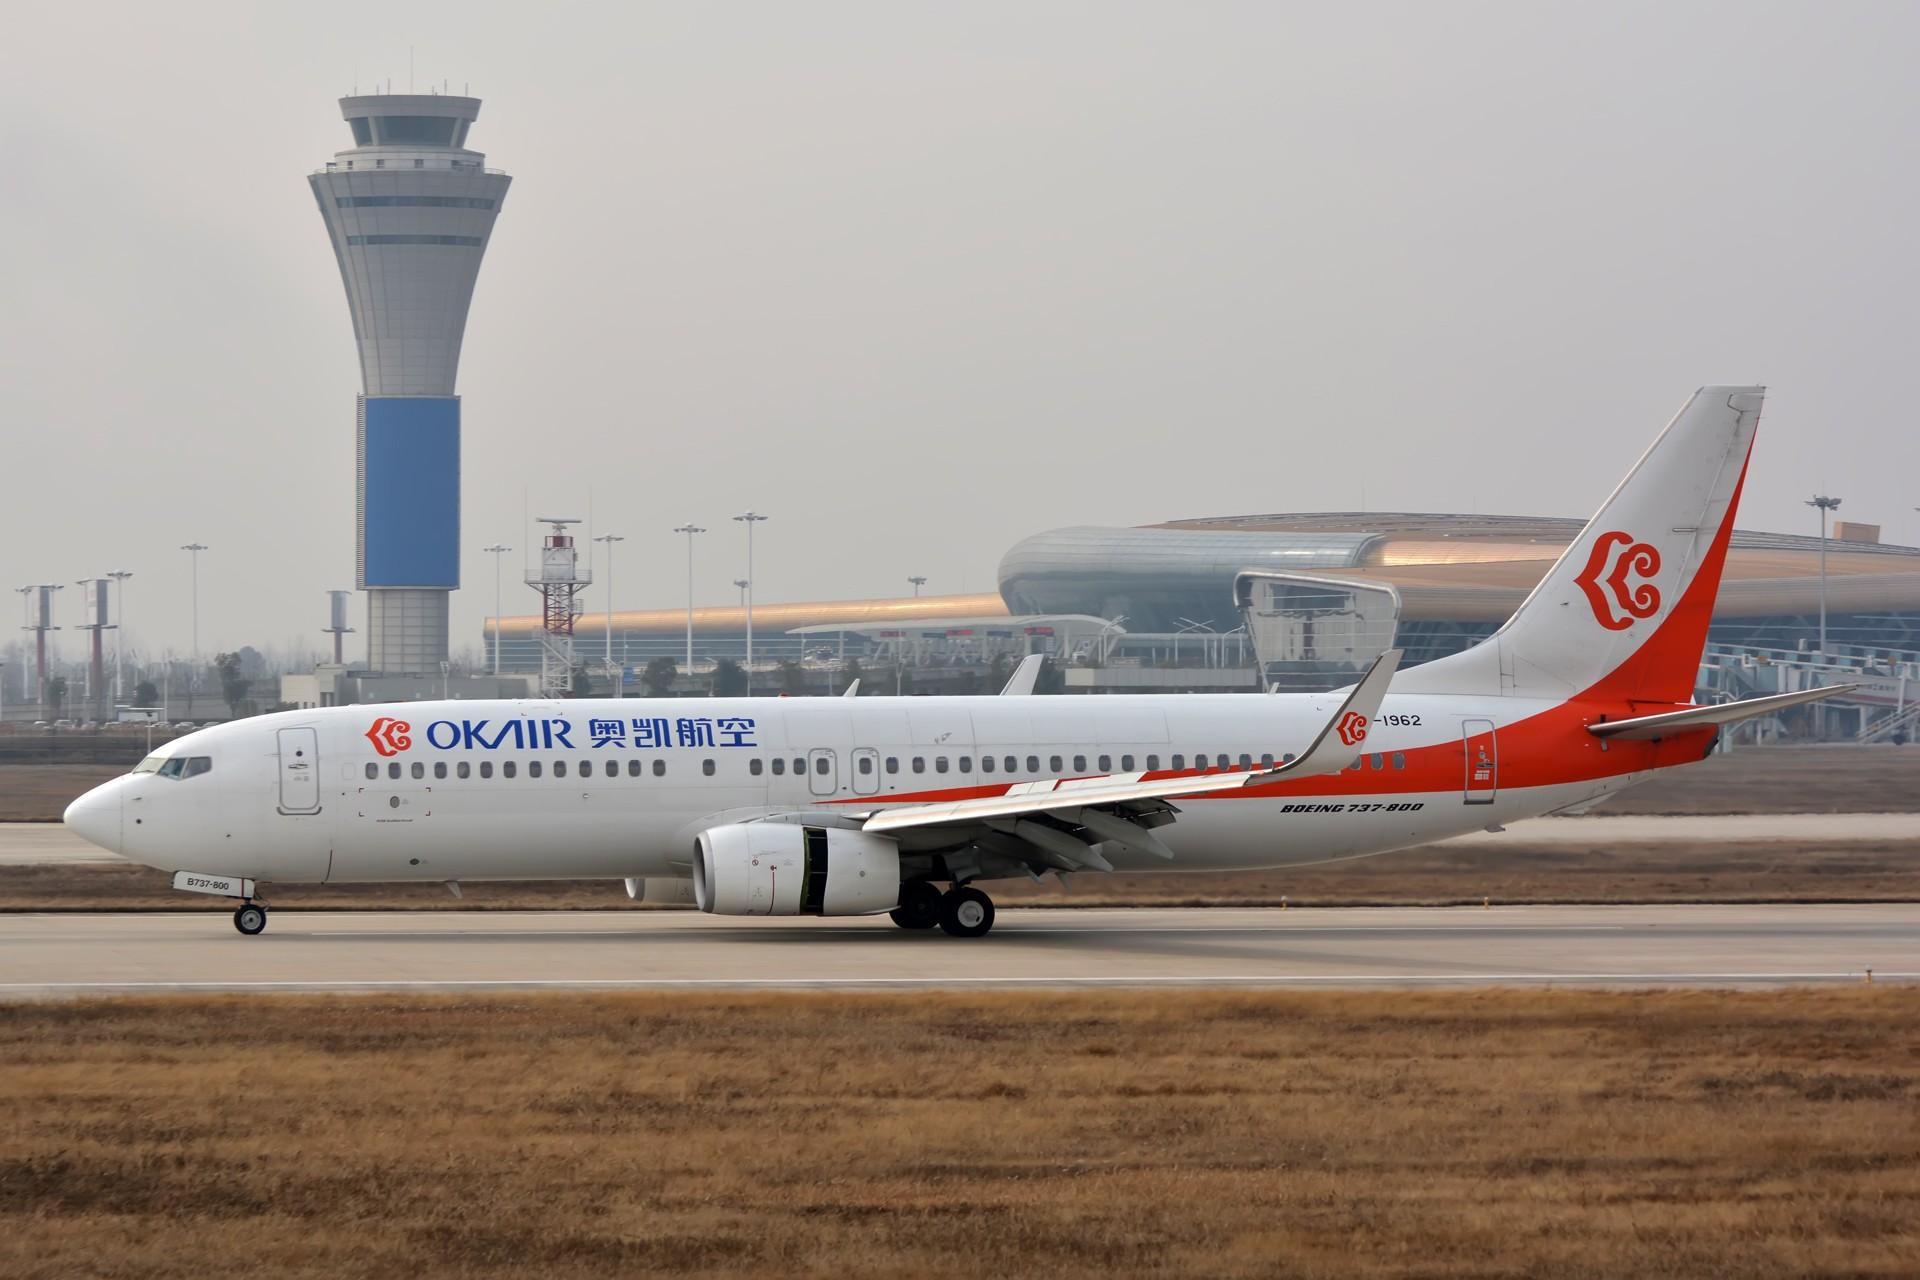 Re:[原创]【合肥飞友会·霸都打机队】除了电风扇就是常规货大图1920×1280 BOEING 737-800 B-1962 中国合肥新桥国际机场